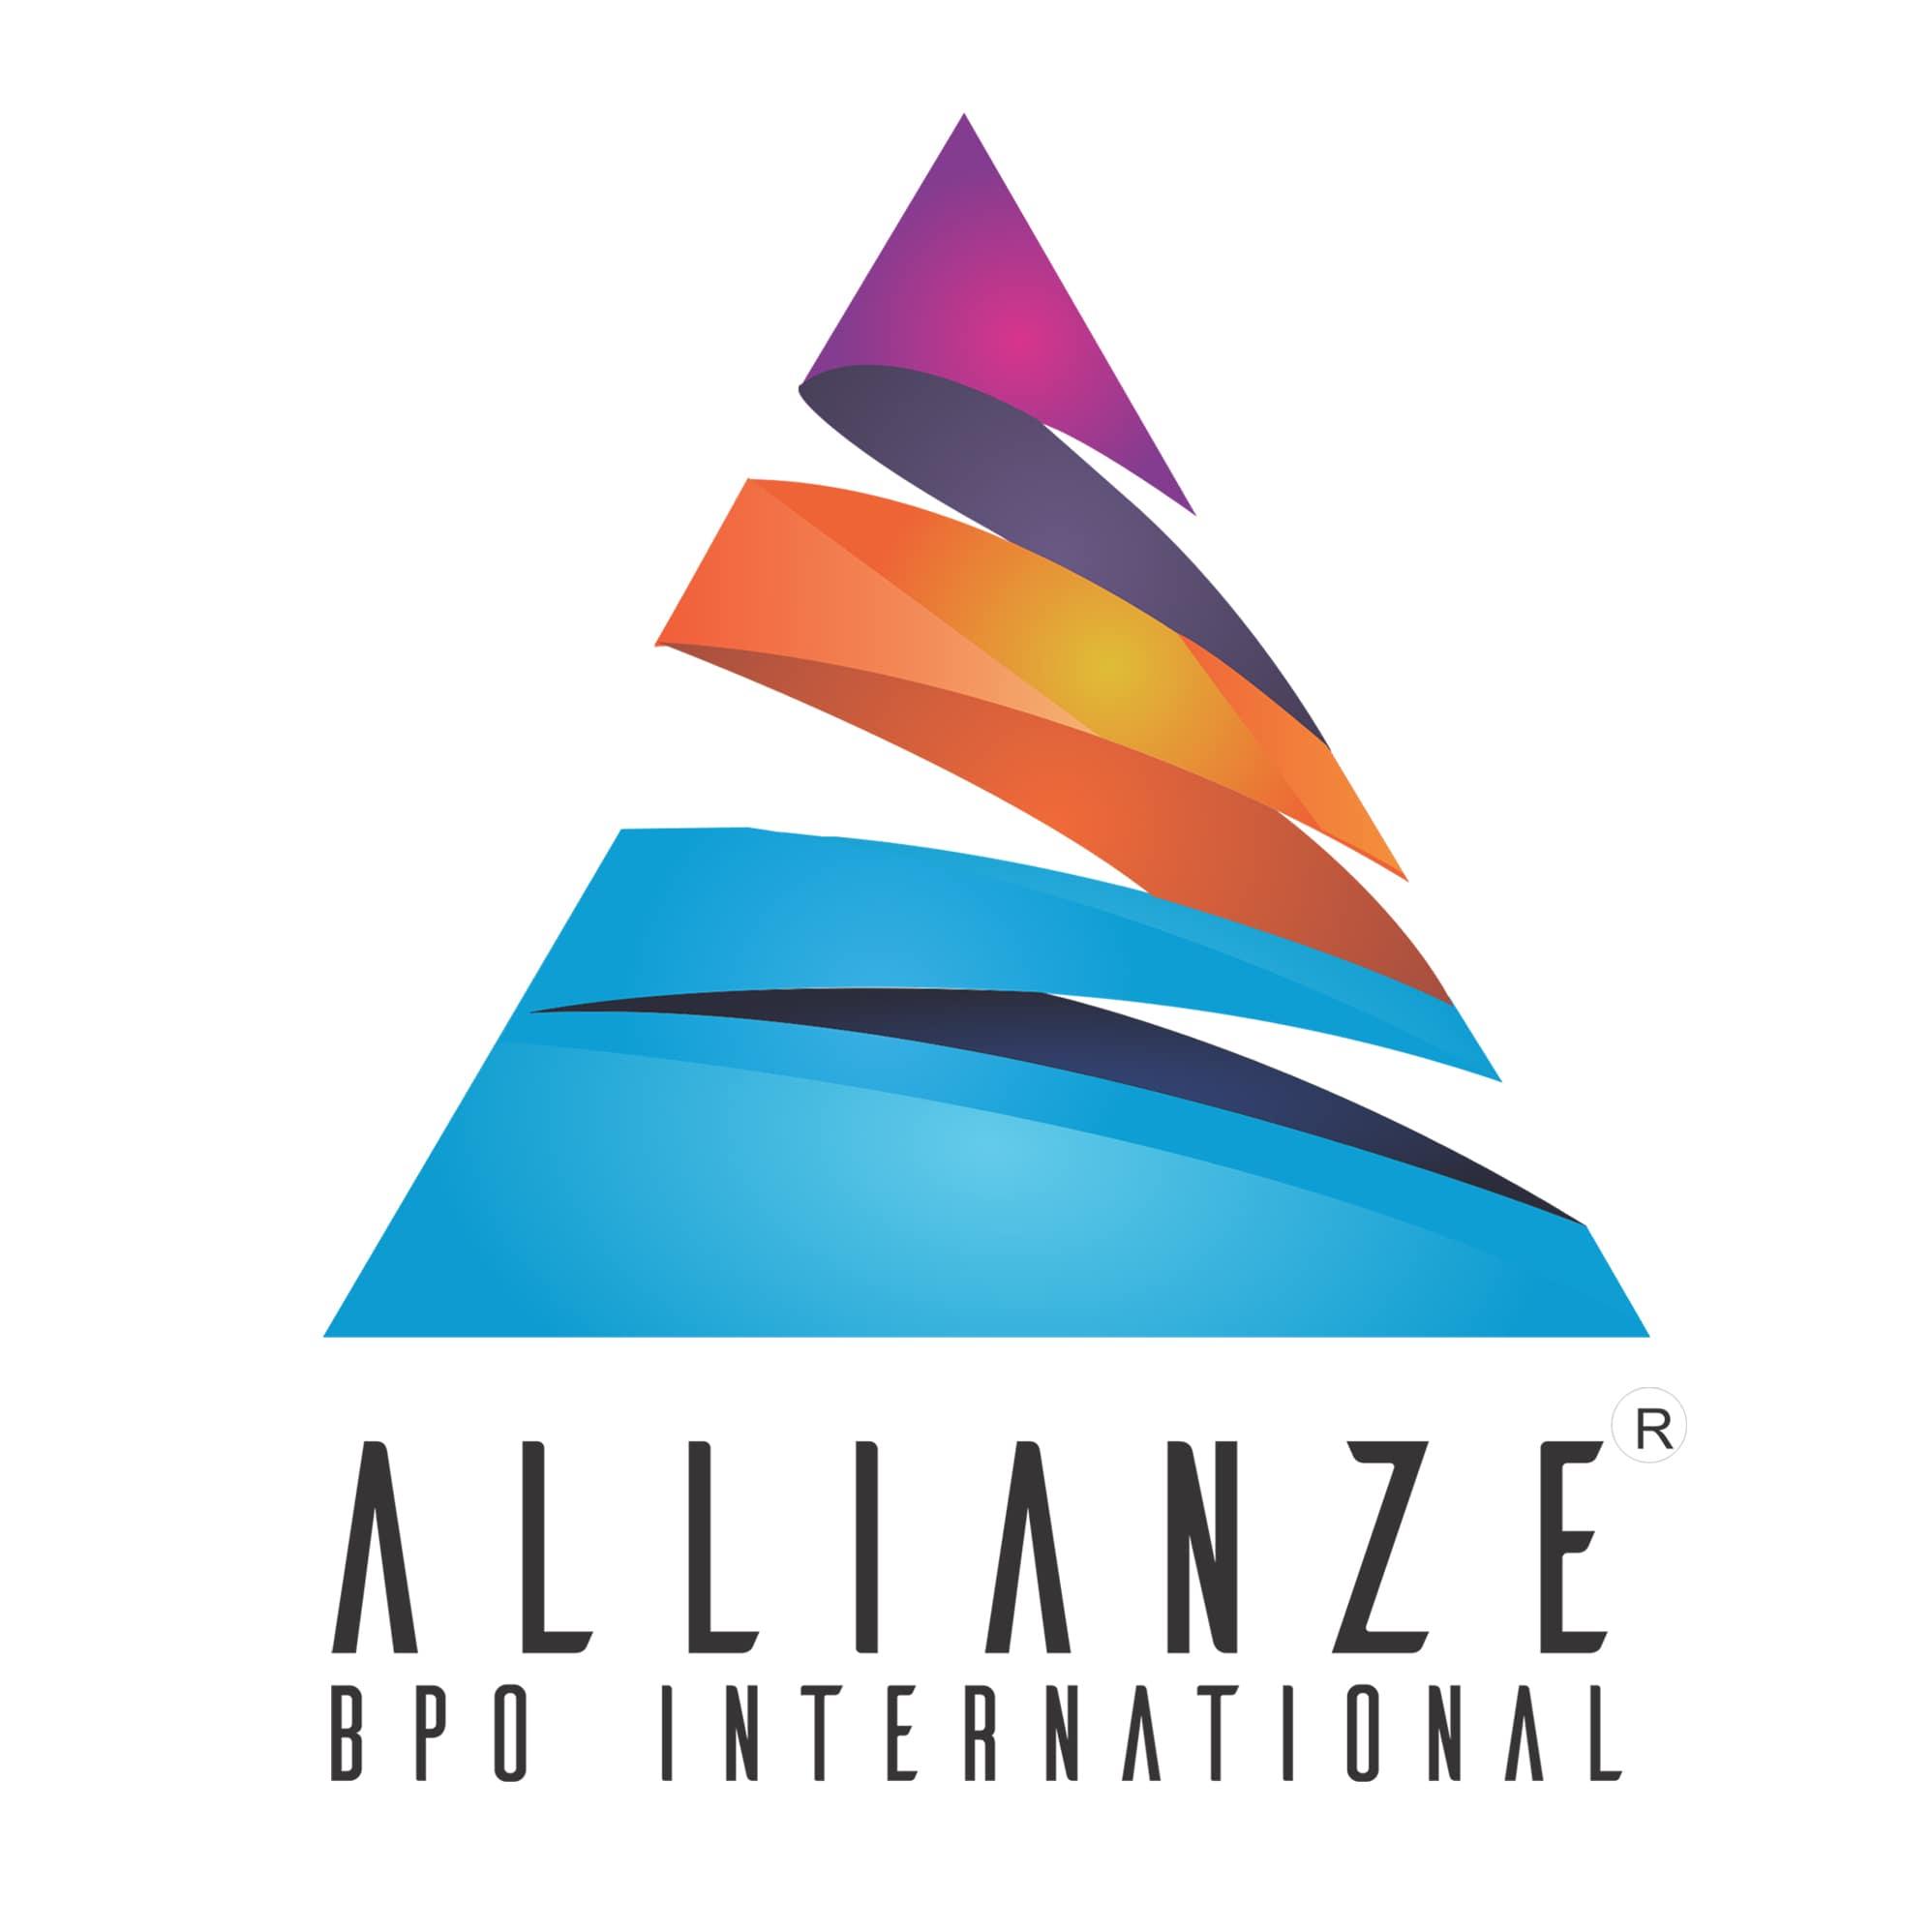 Allianze BPO International Logo